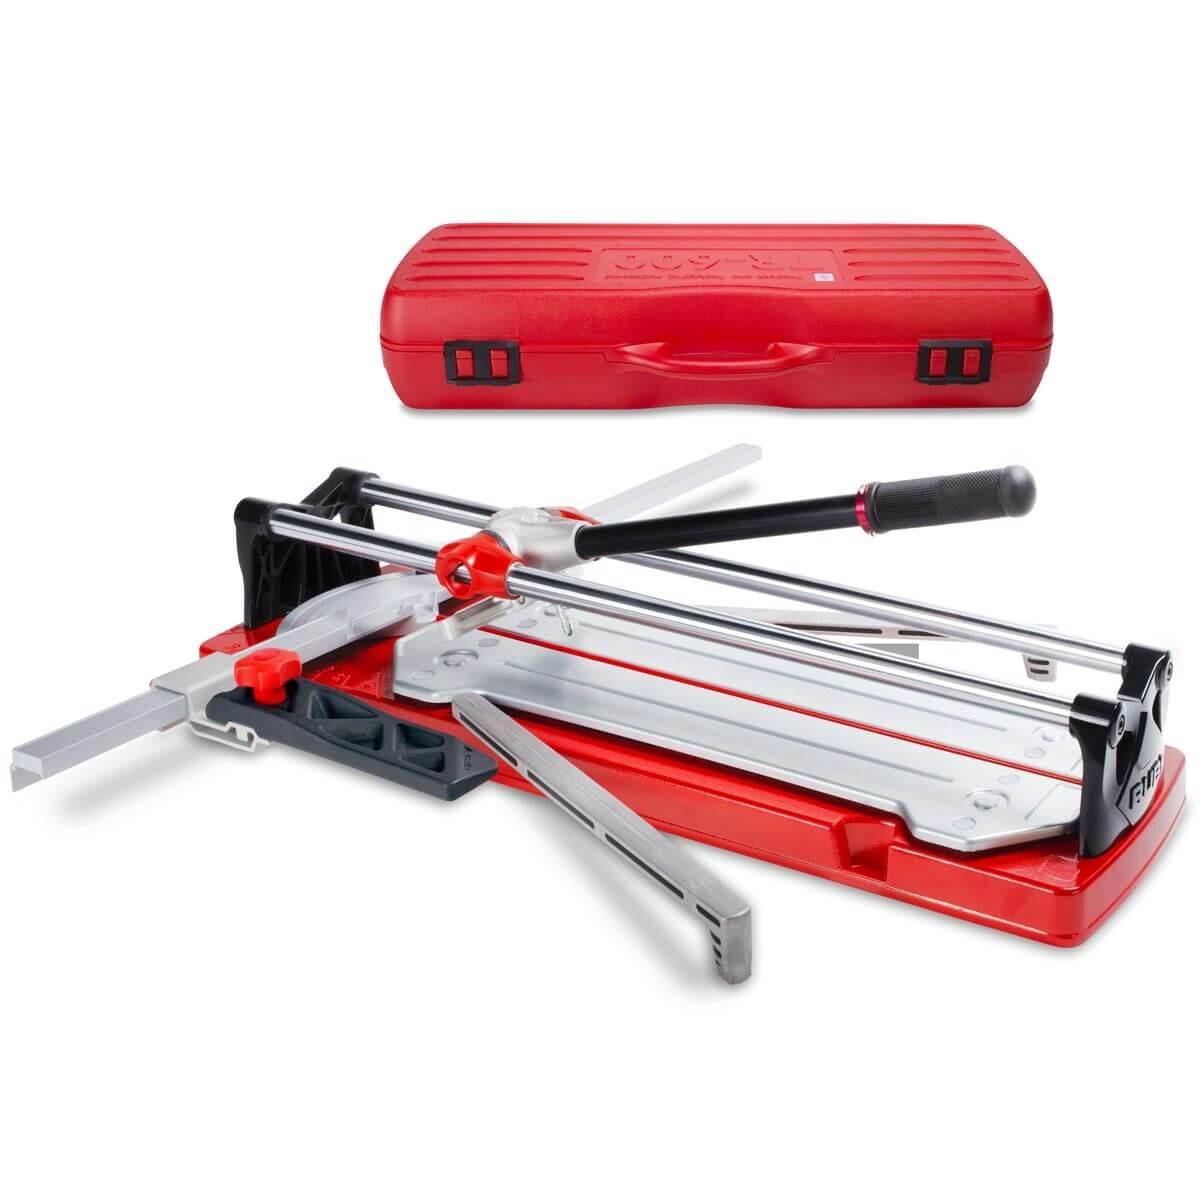 Rubi Tr Magnet Tile Cutters Contractors Direct